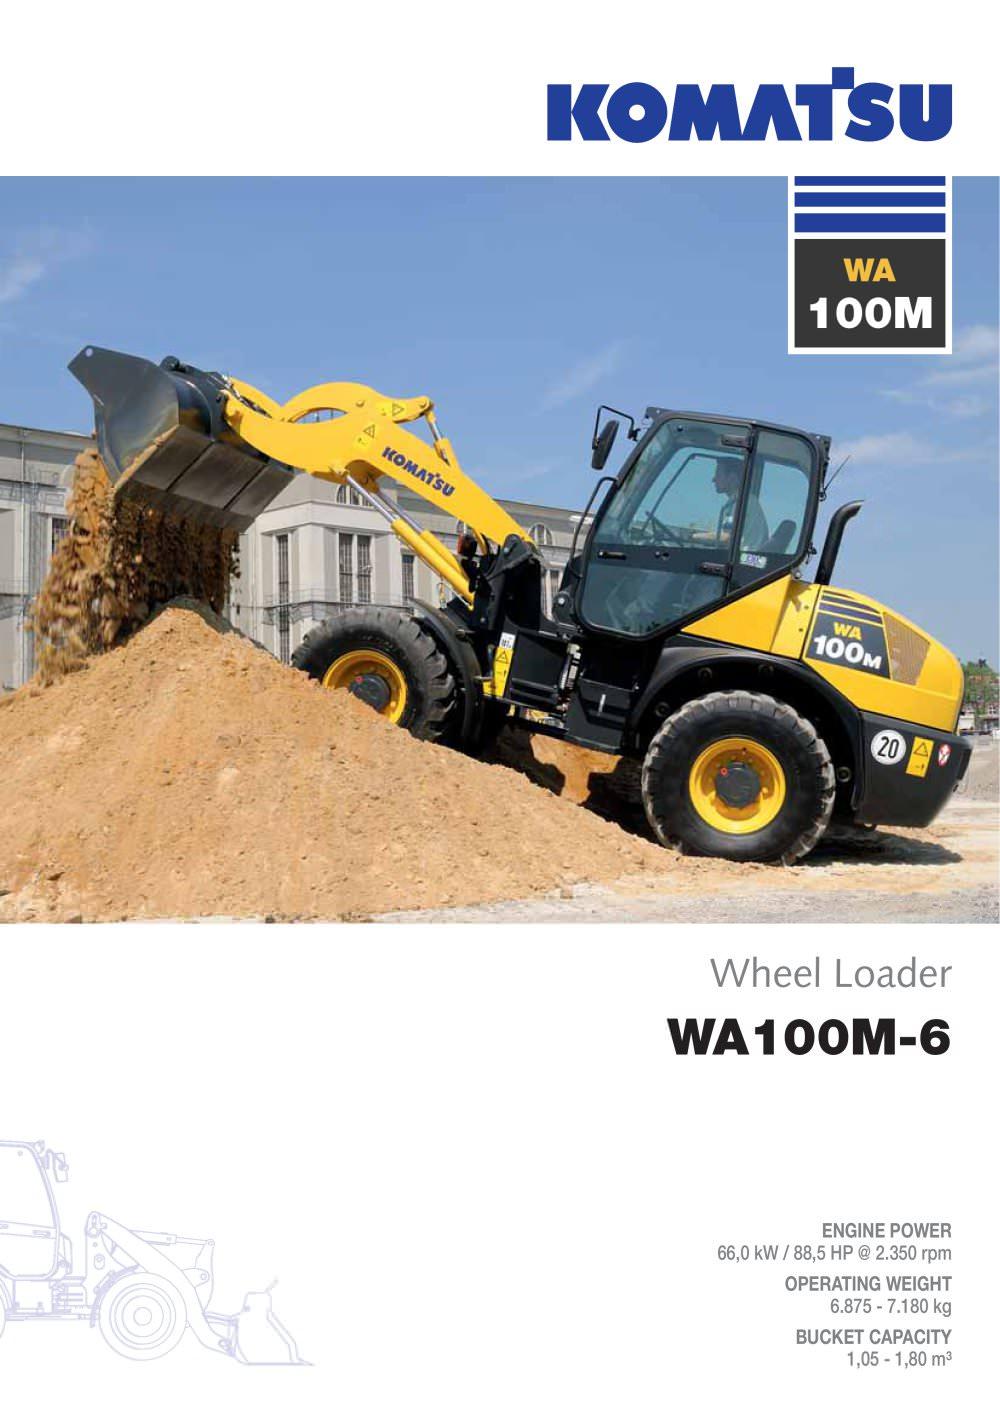 WA100M-6 - 1 / 12 Pages